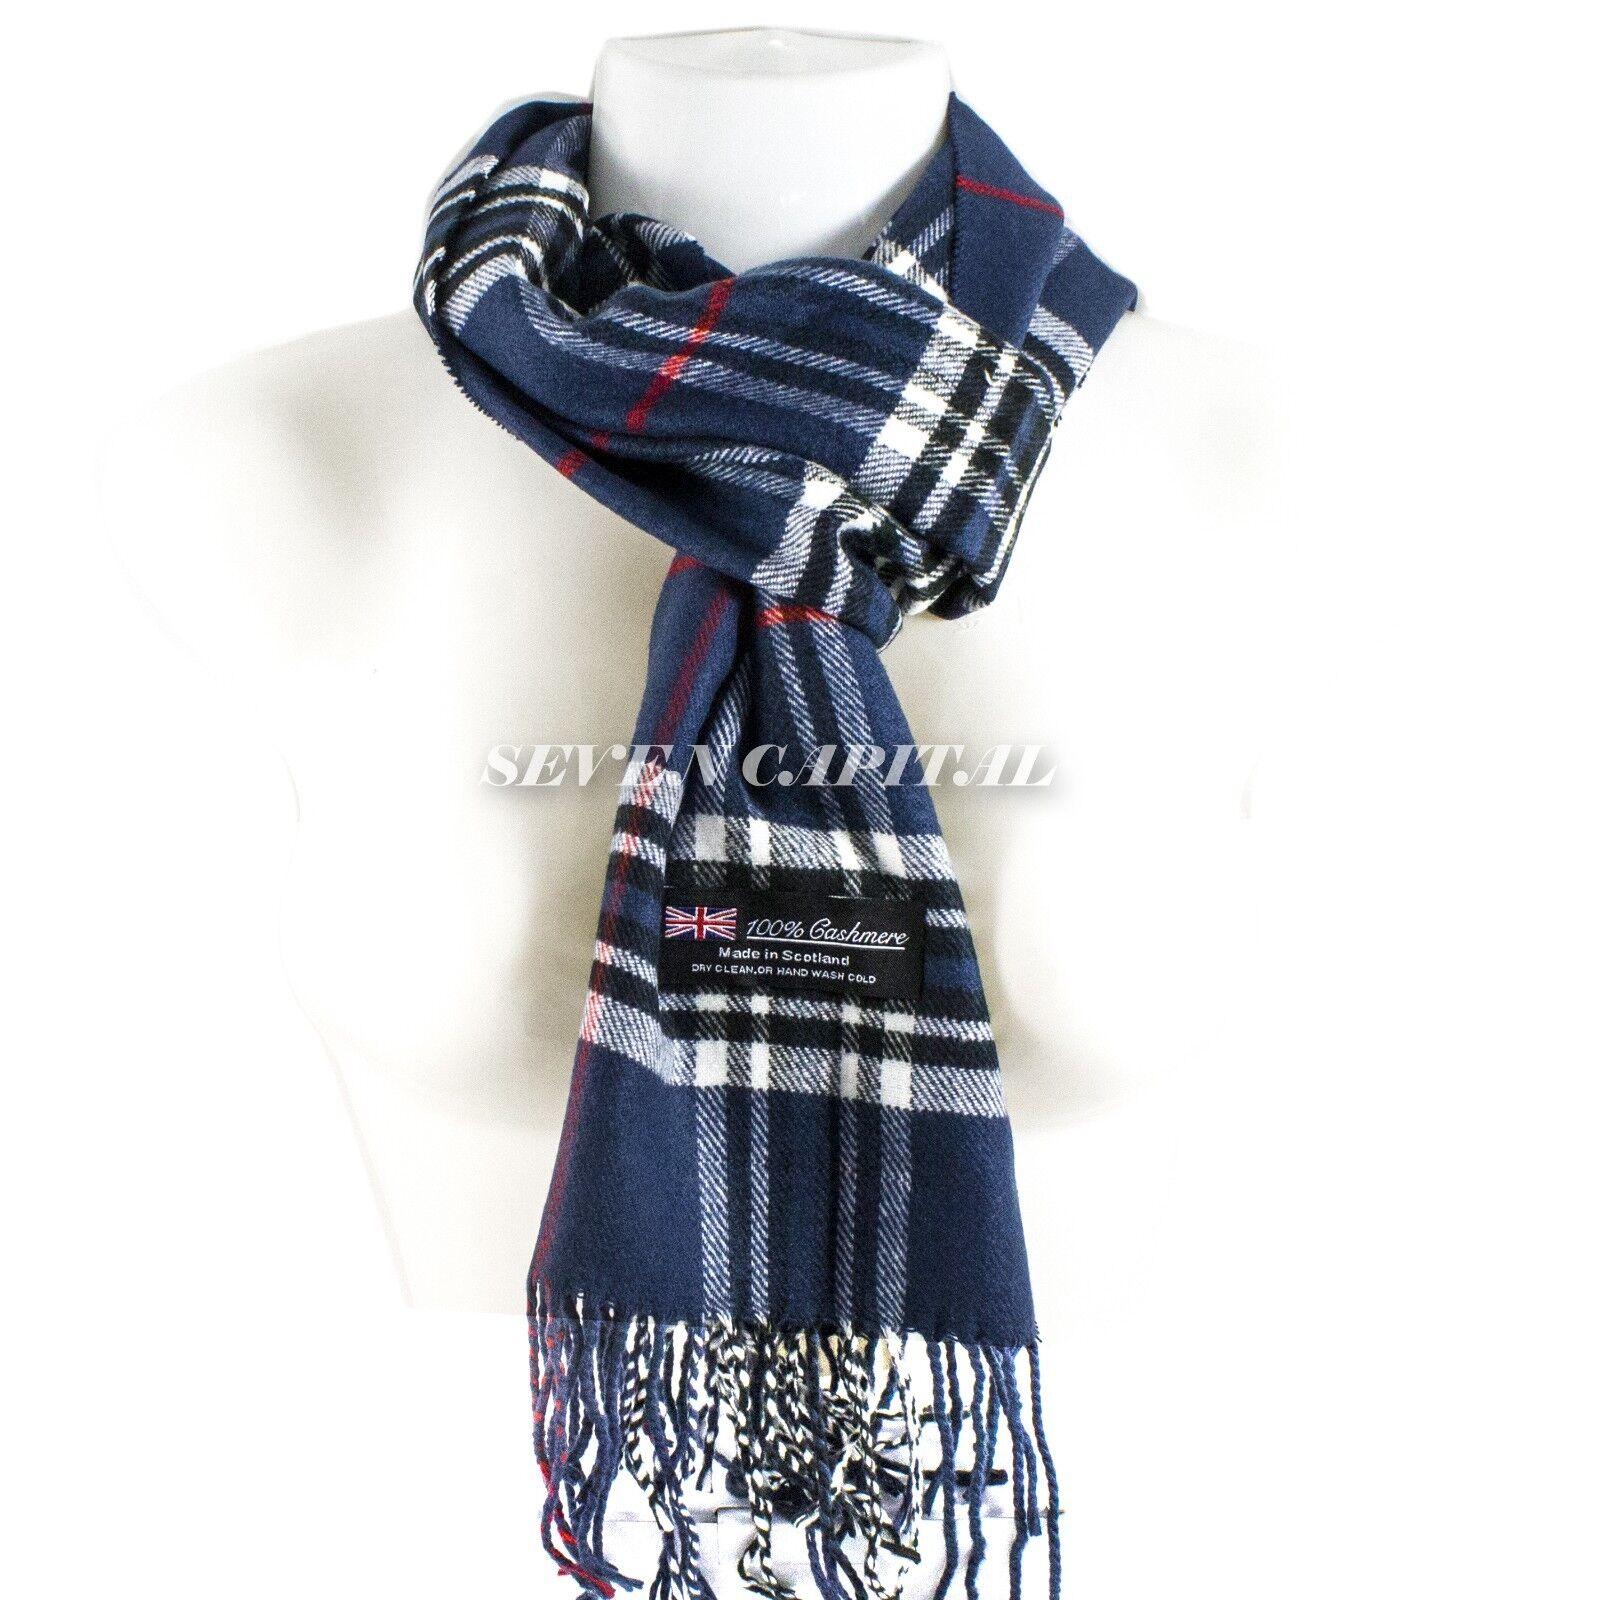 Mens Womens Winter Warm SCOTLAND Made 100% CASHMERE Scarf Scarves Plaid Wool 6. Plaid: Navy/White/Black